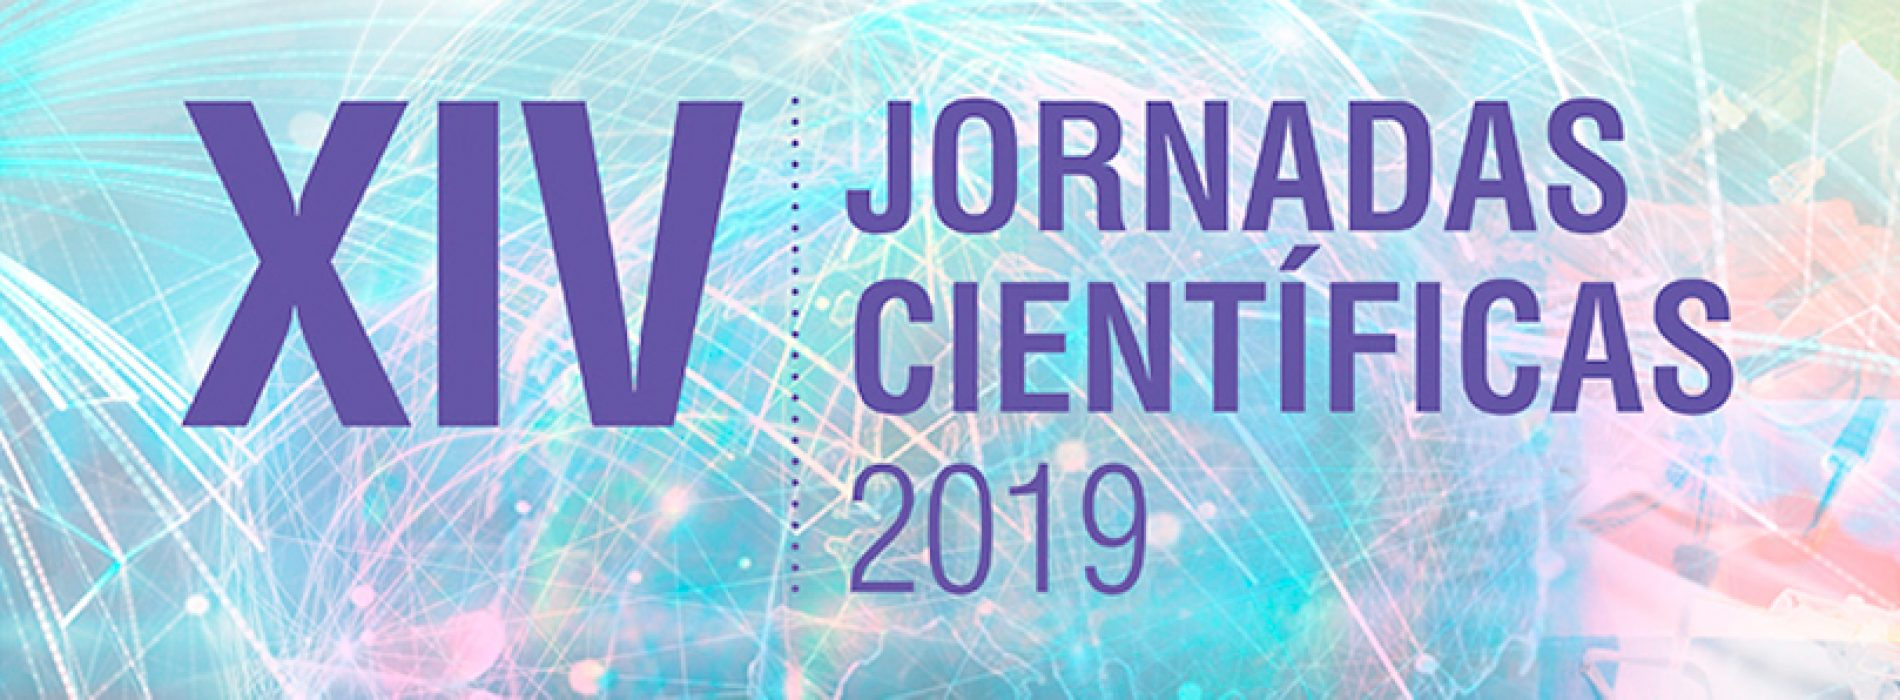 XIV scientific conference 2019